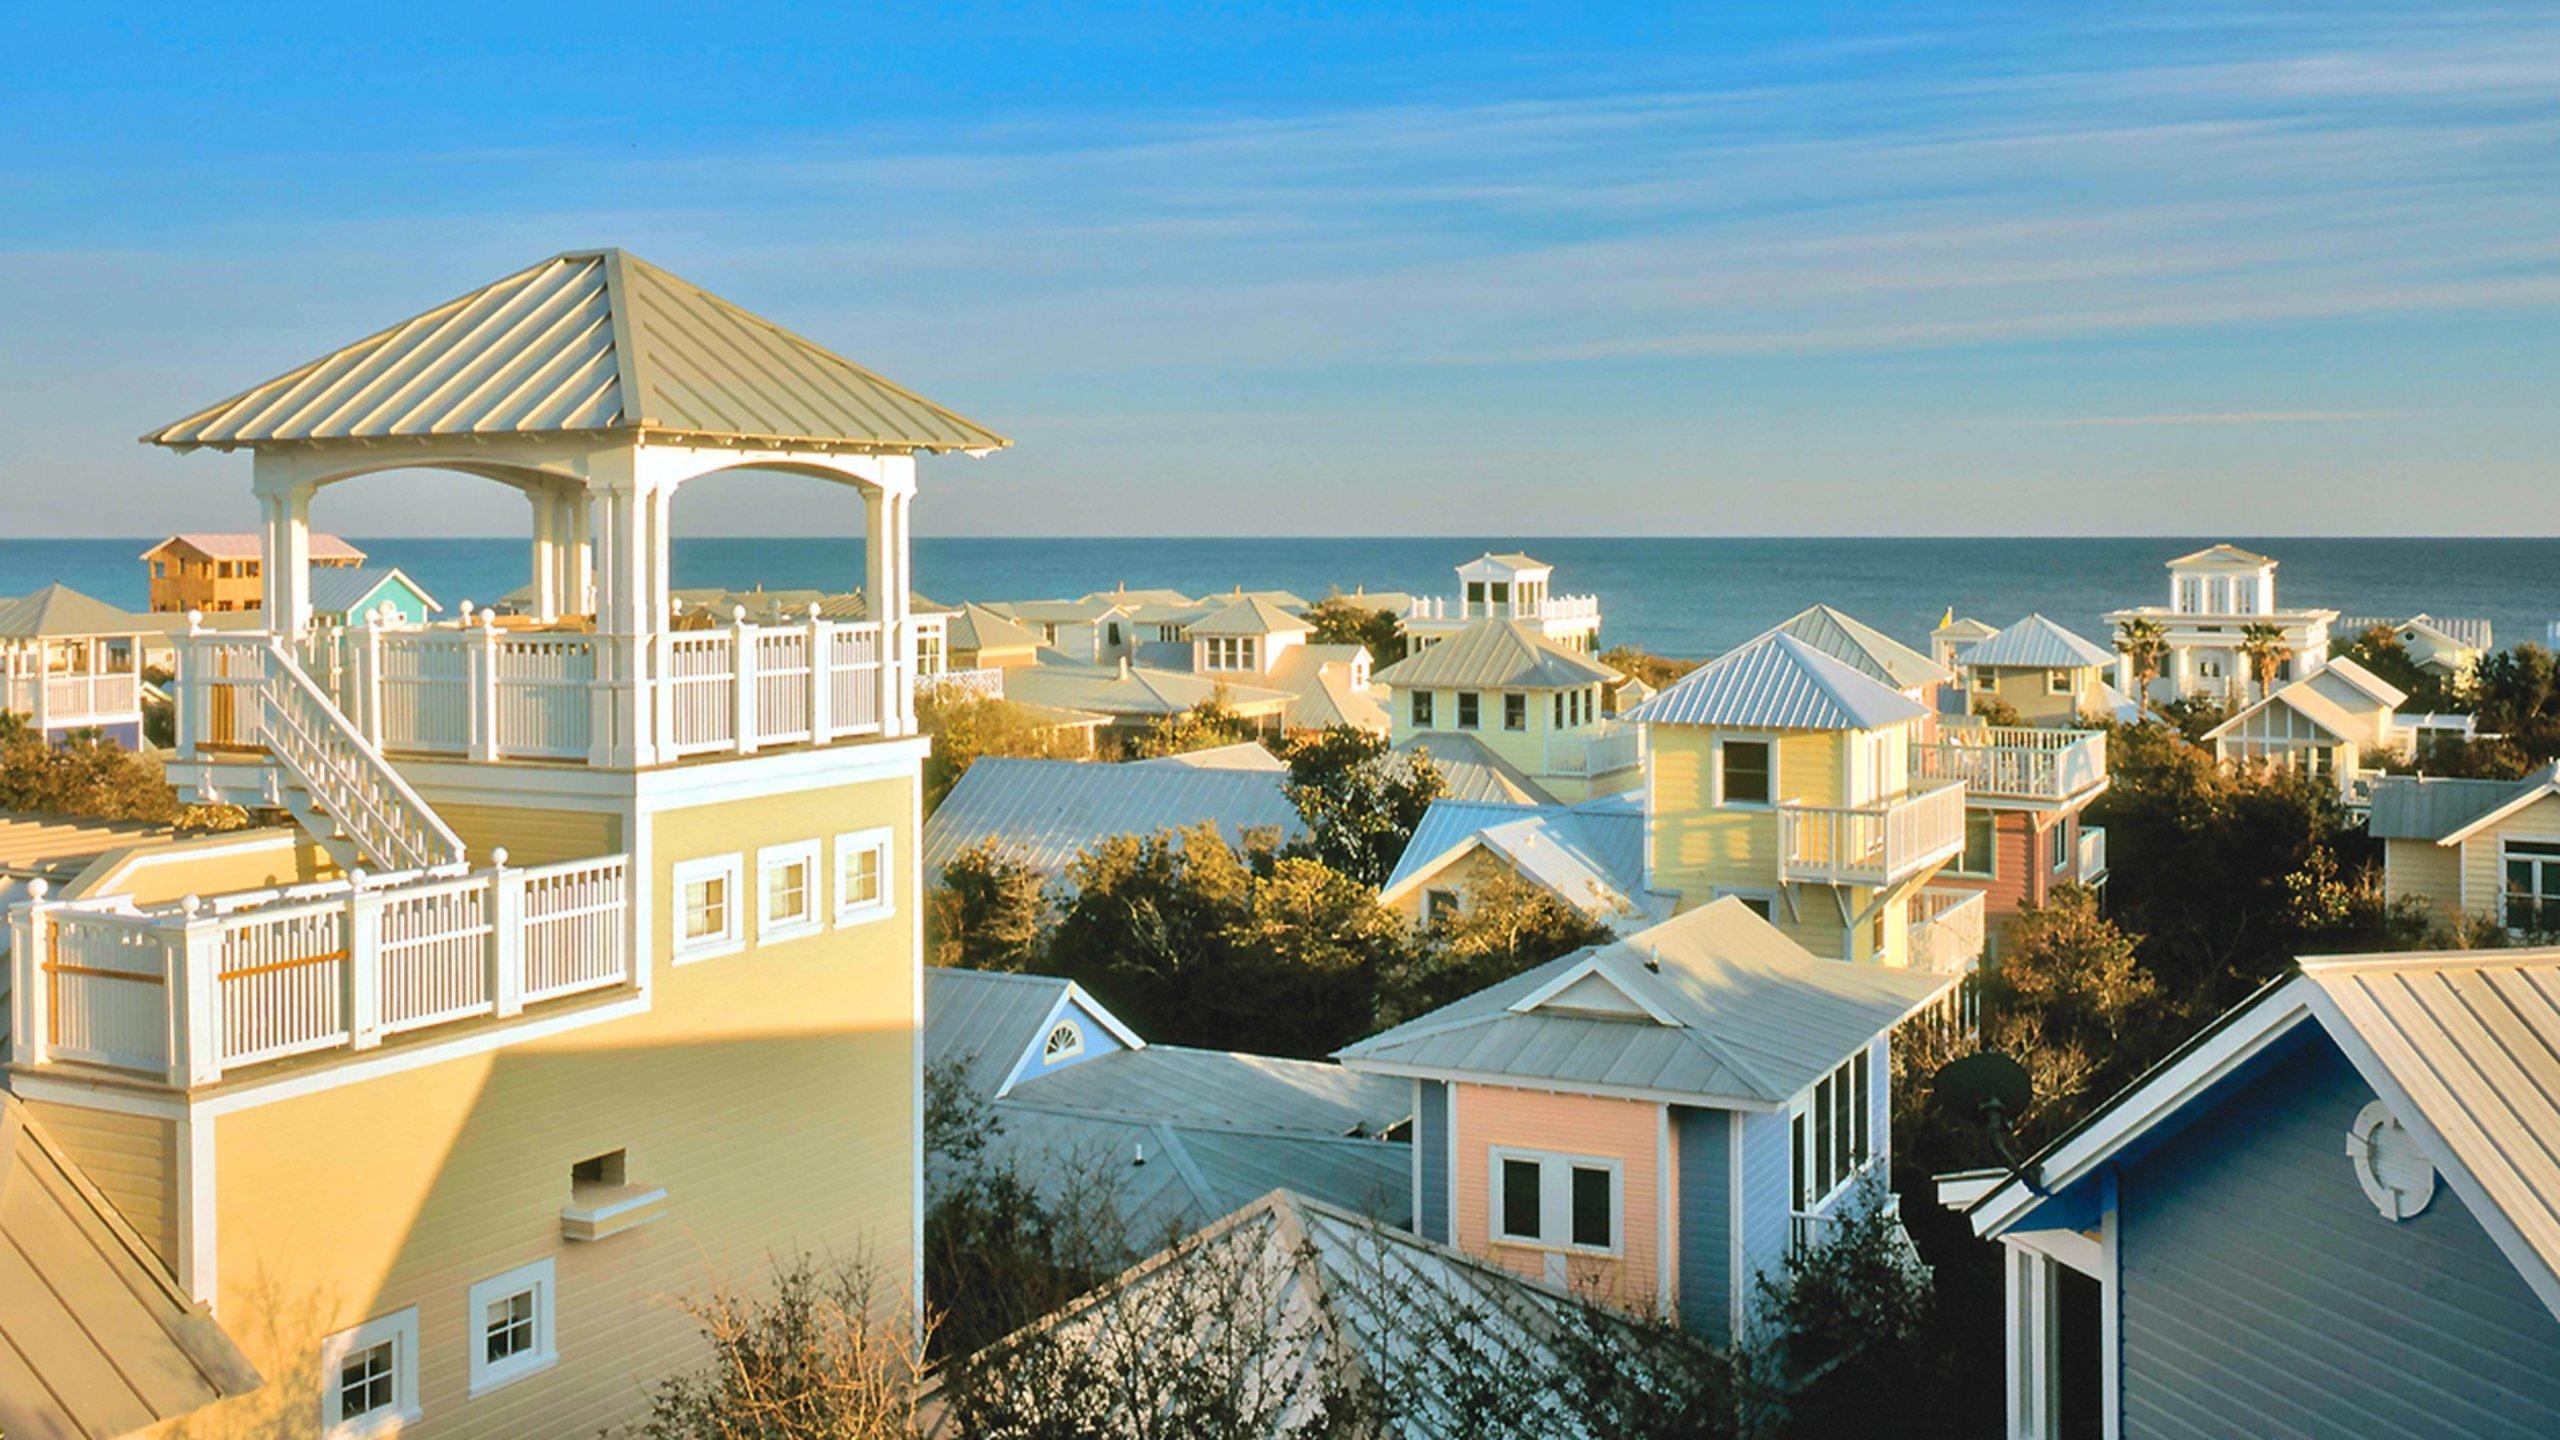 Seaside, Santa Rosa Beach, Florida, United States of America